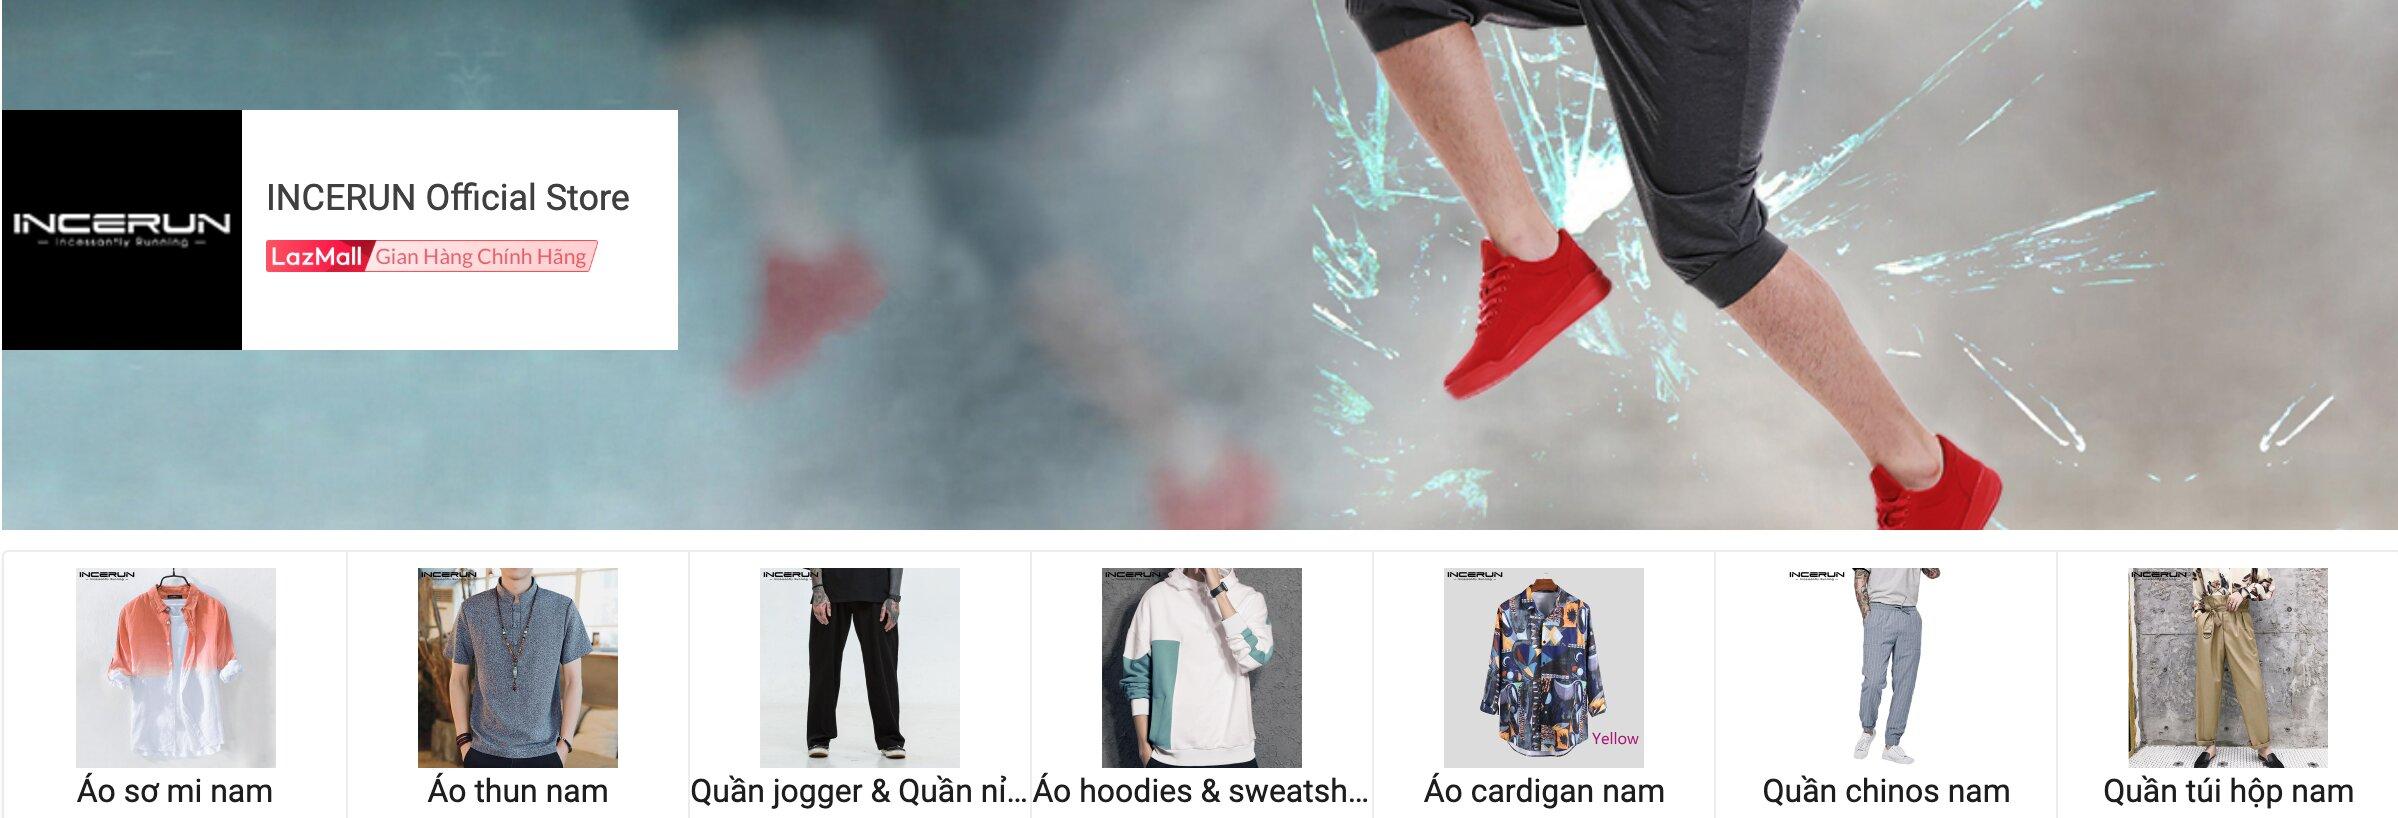 Coupon Lazada giảm 15k, 20k, 25k cho các sản phẩm của Incerun Official Store